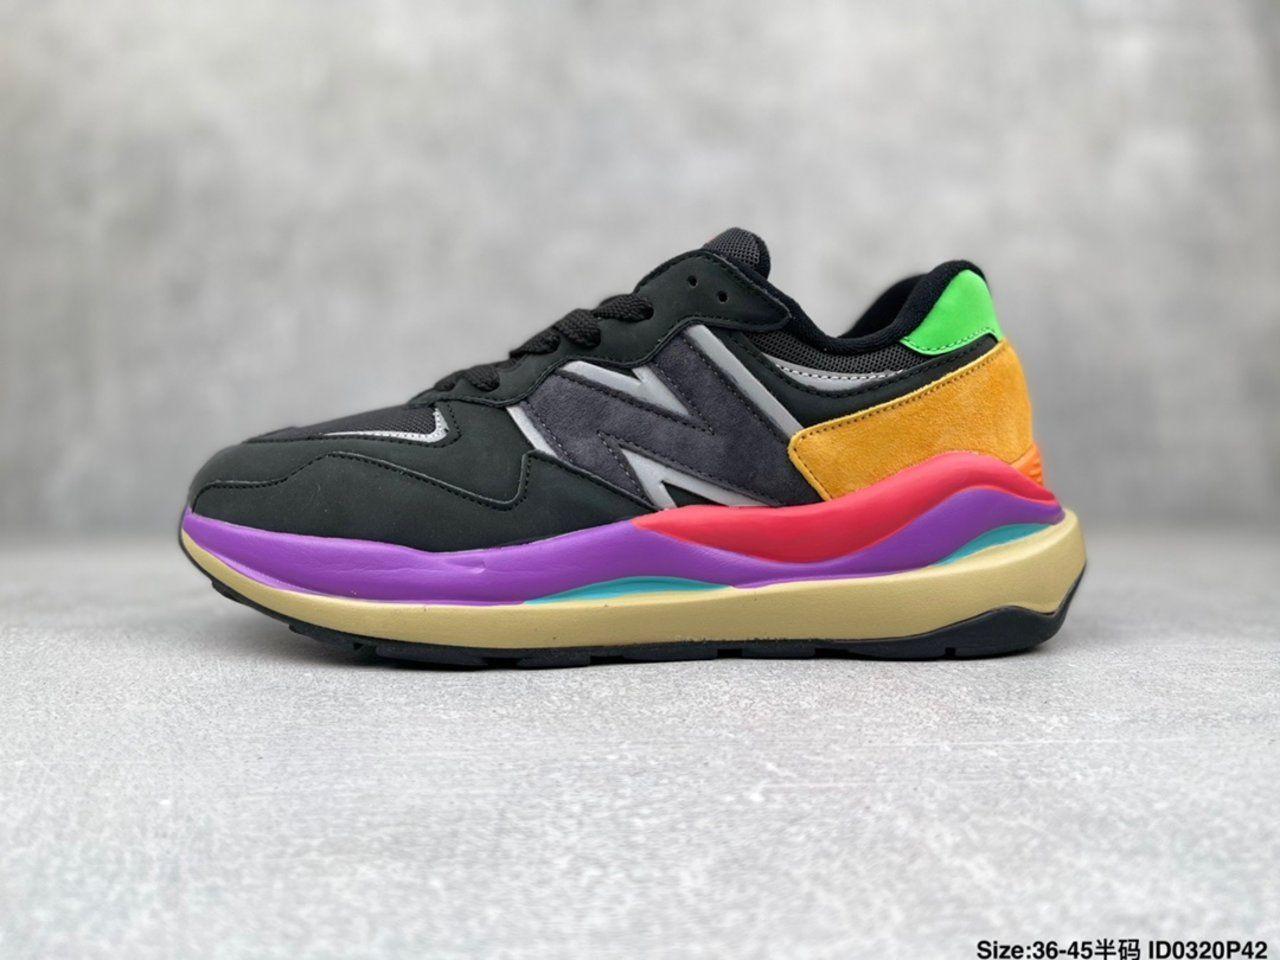 New Balance jogging shoes M5740LB Left